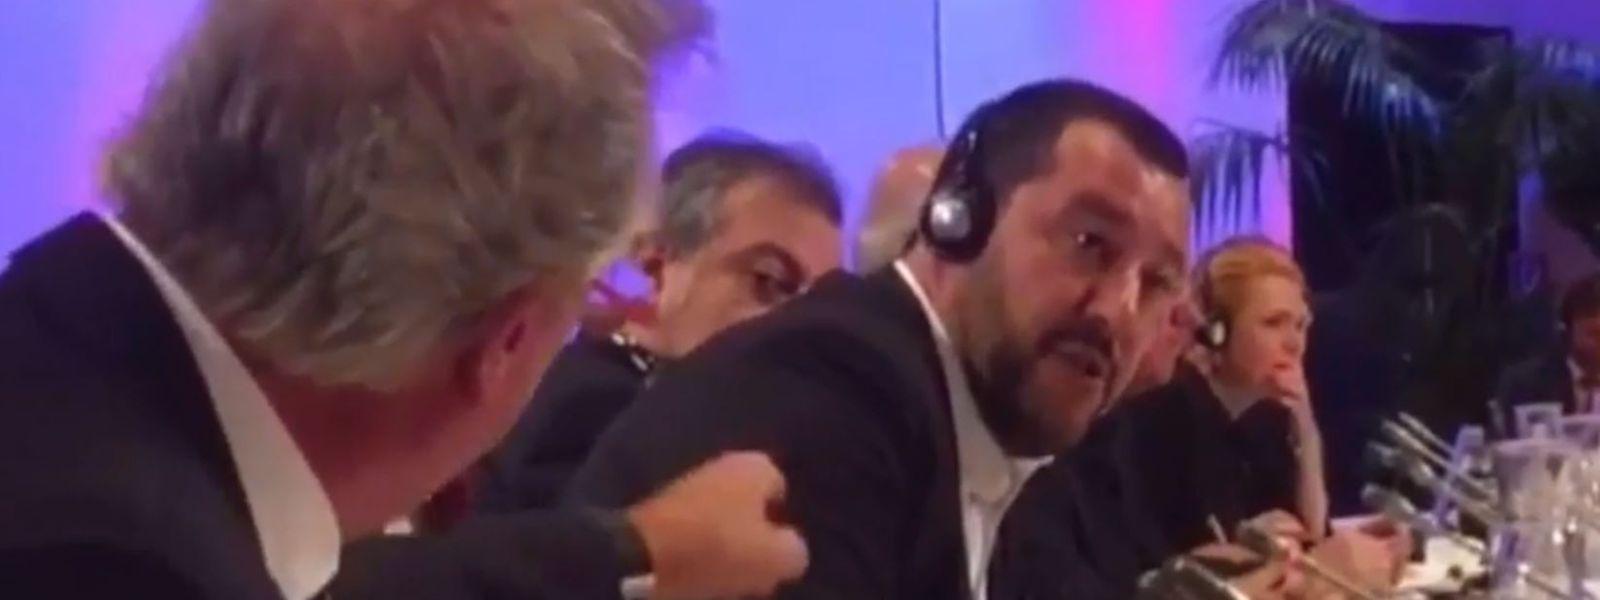 "Jean Asselborn interrompeu Matteo Salvini com um sonoro ""merda, então!""."